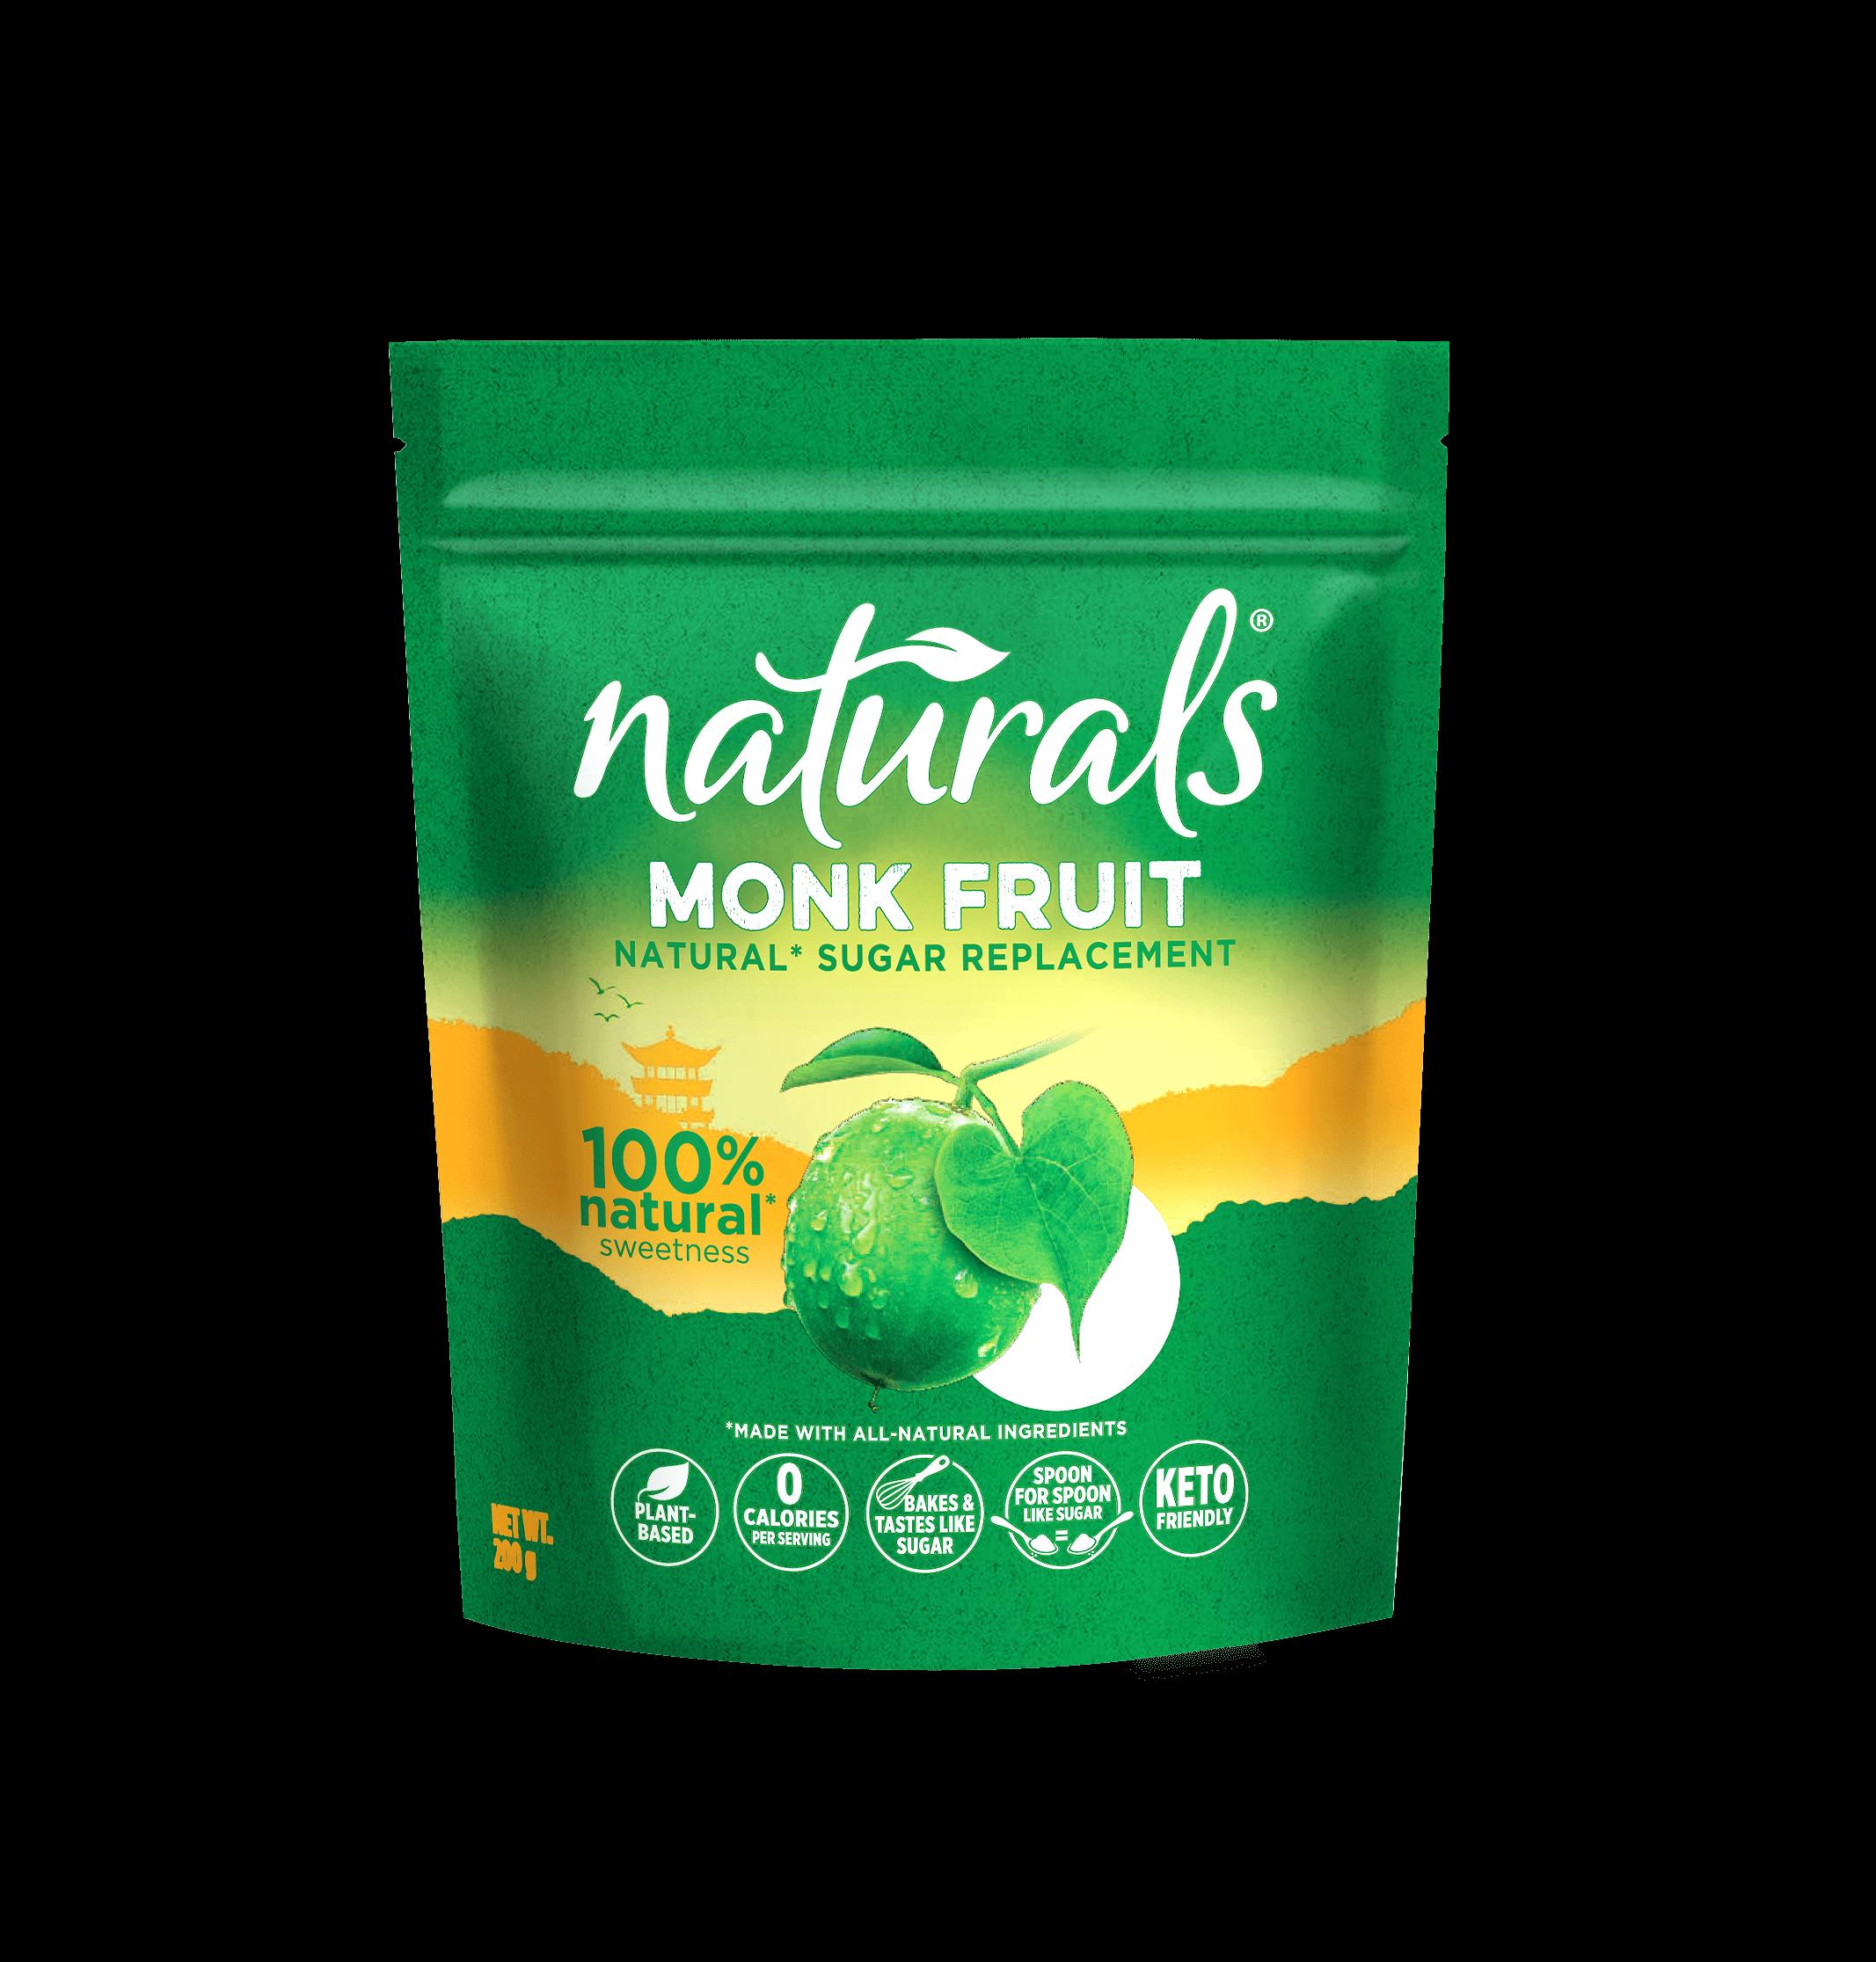 natural-monk-fruit-pouch